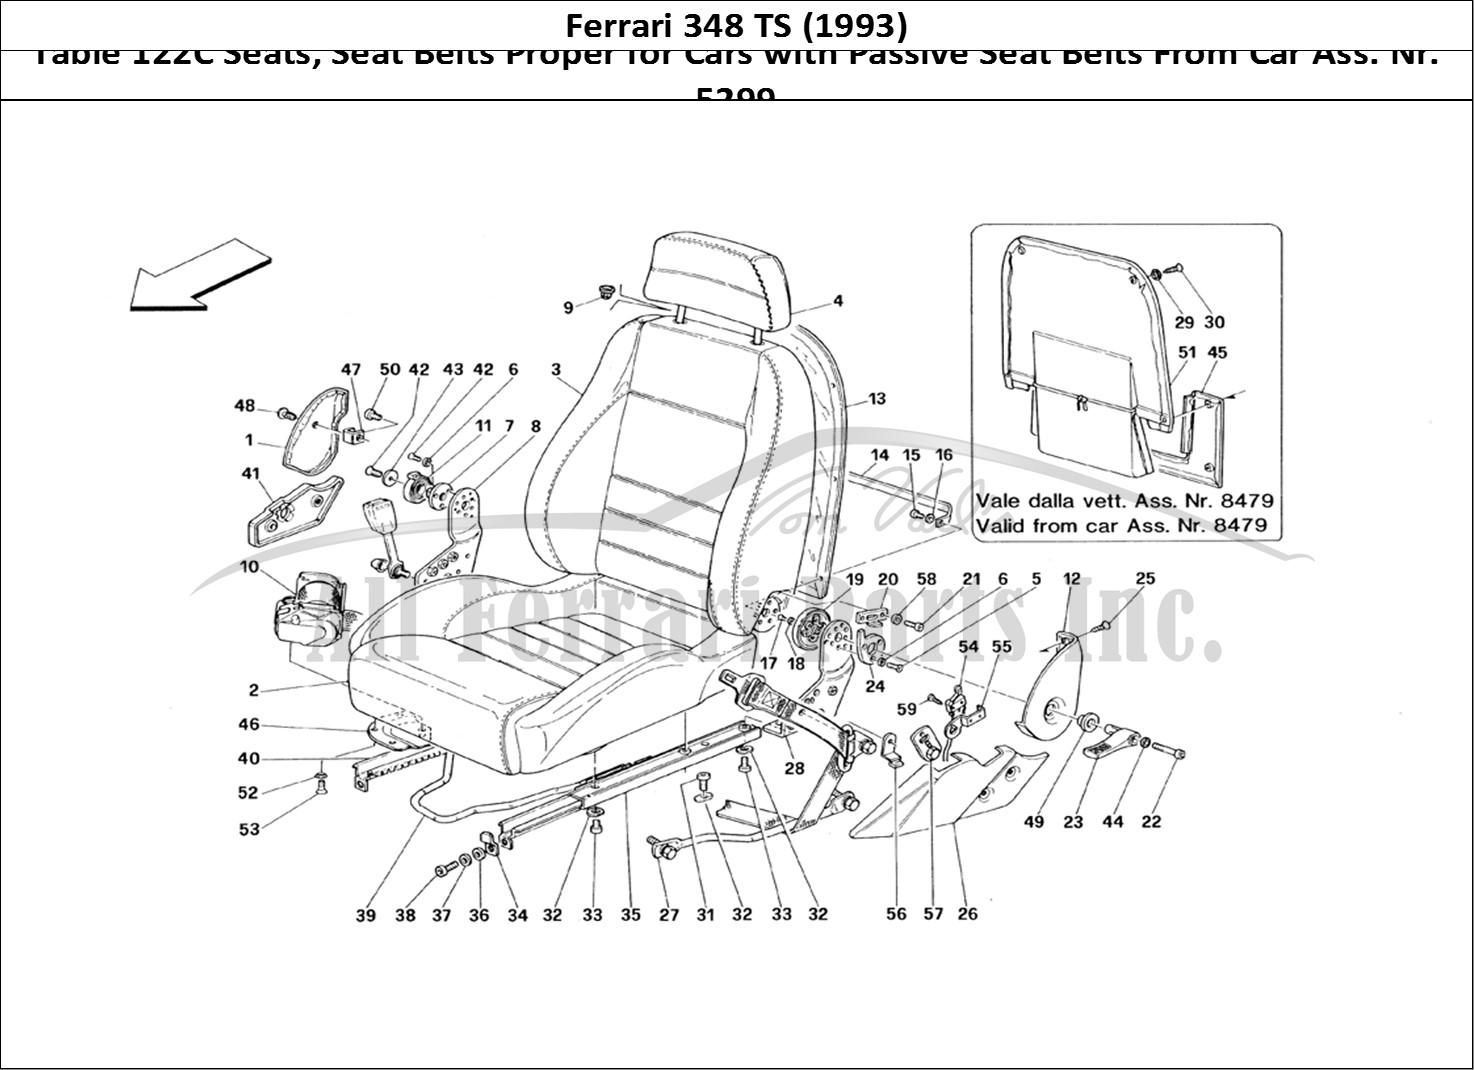 Buy Original Ferrari 348 Ts 122c Seats Seat Belts